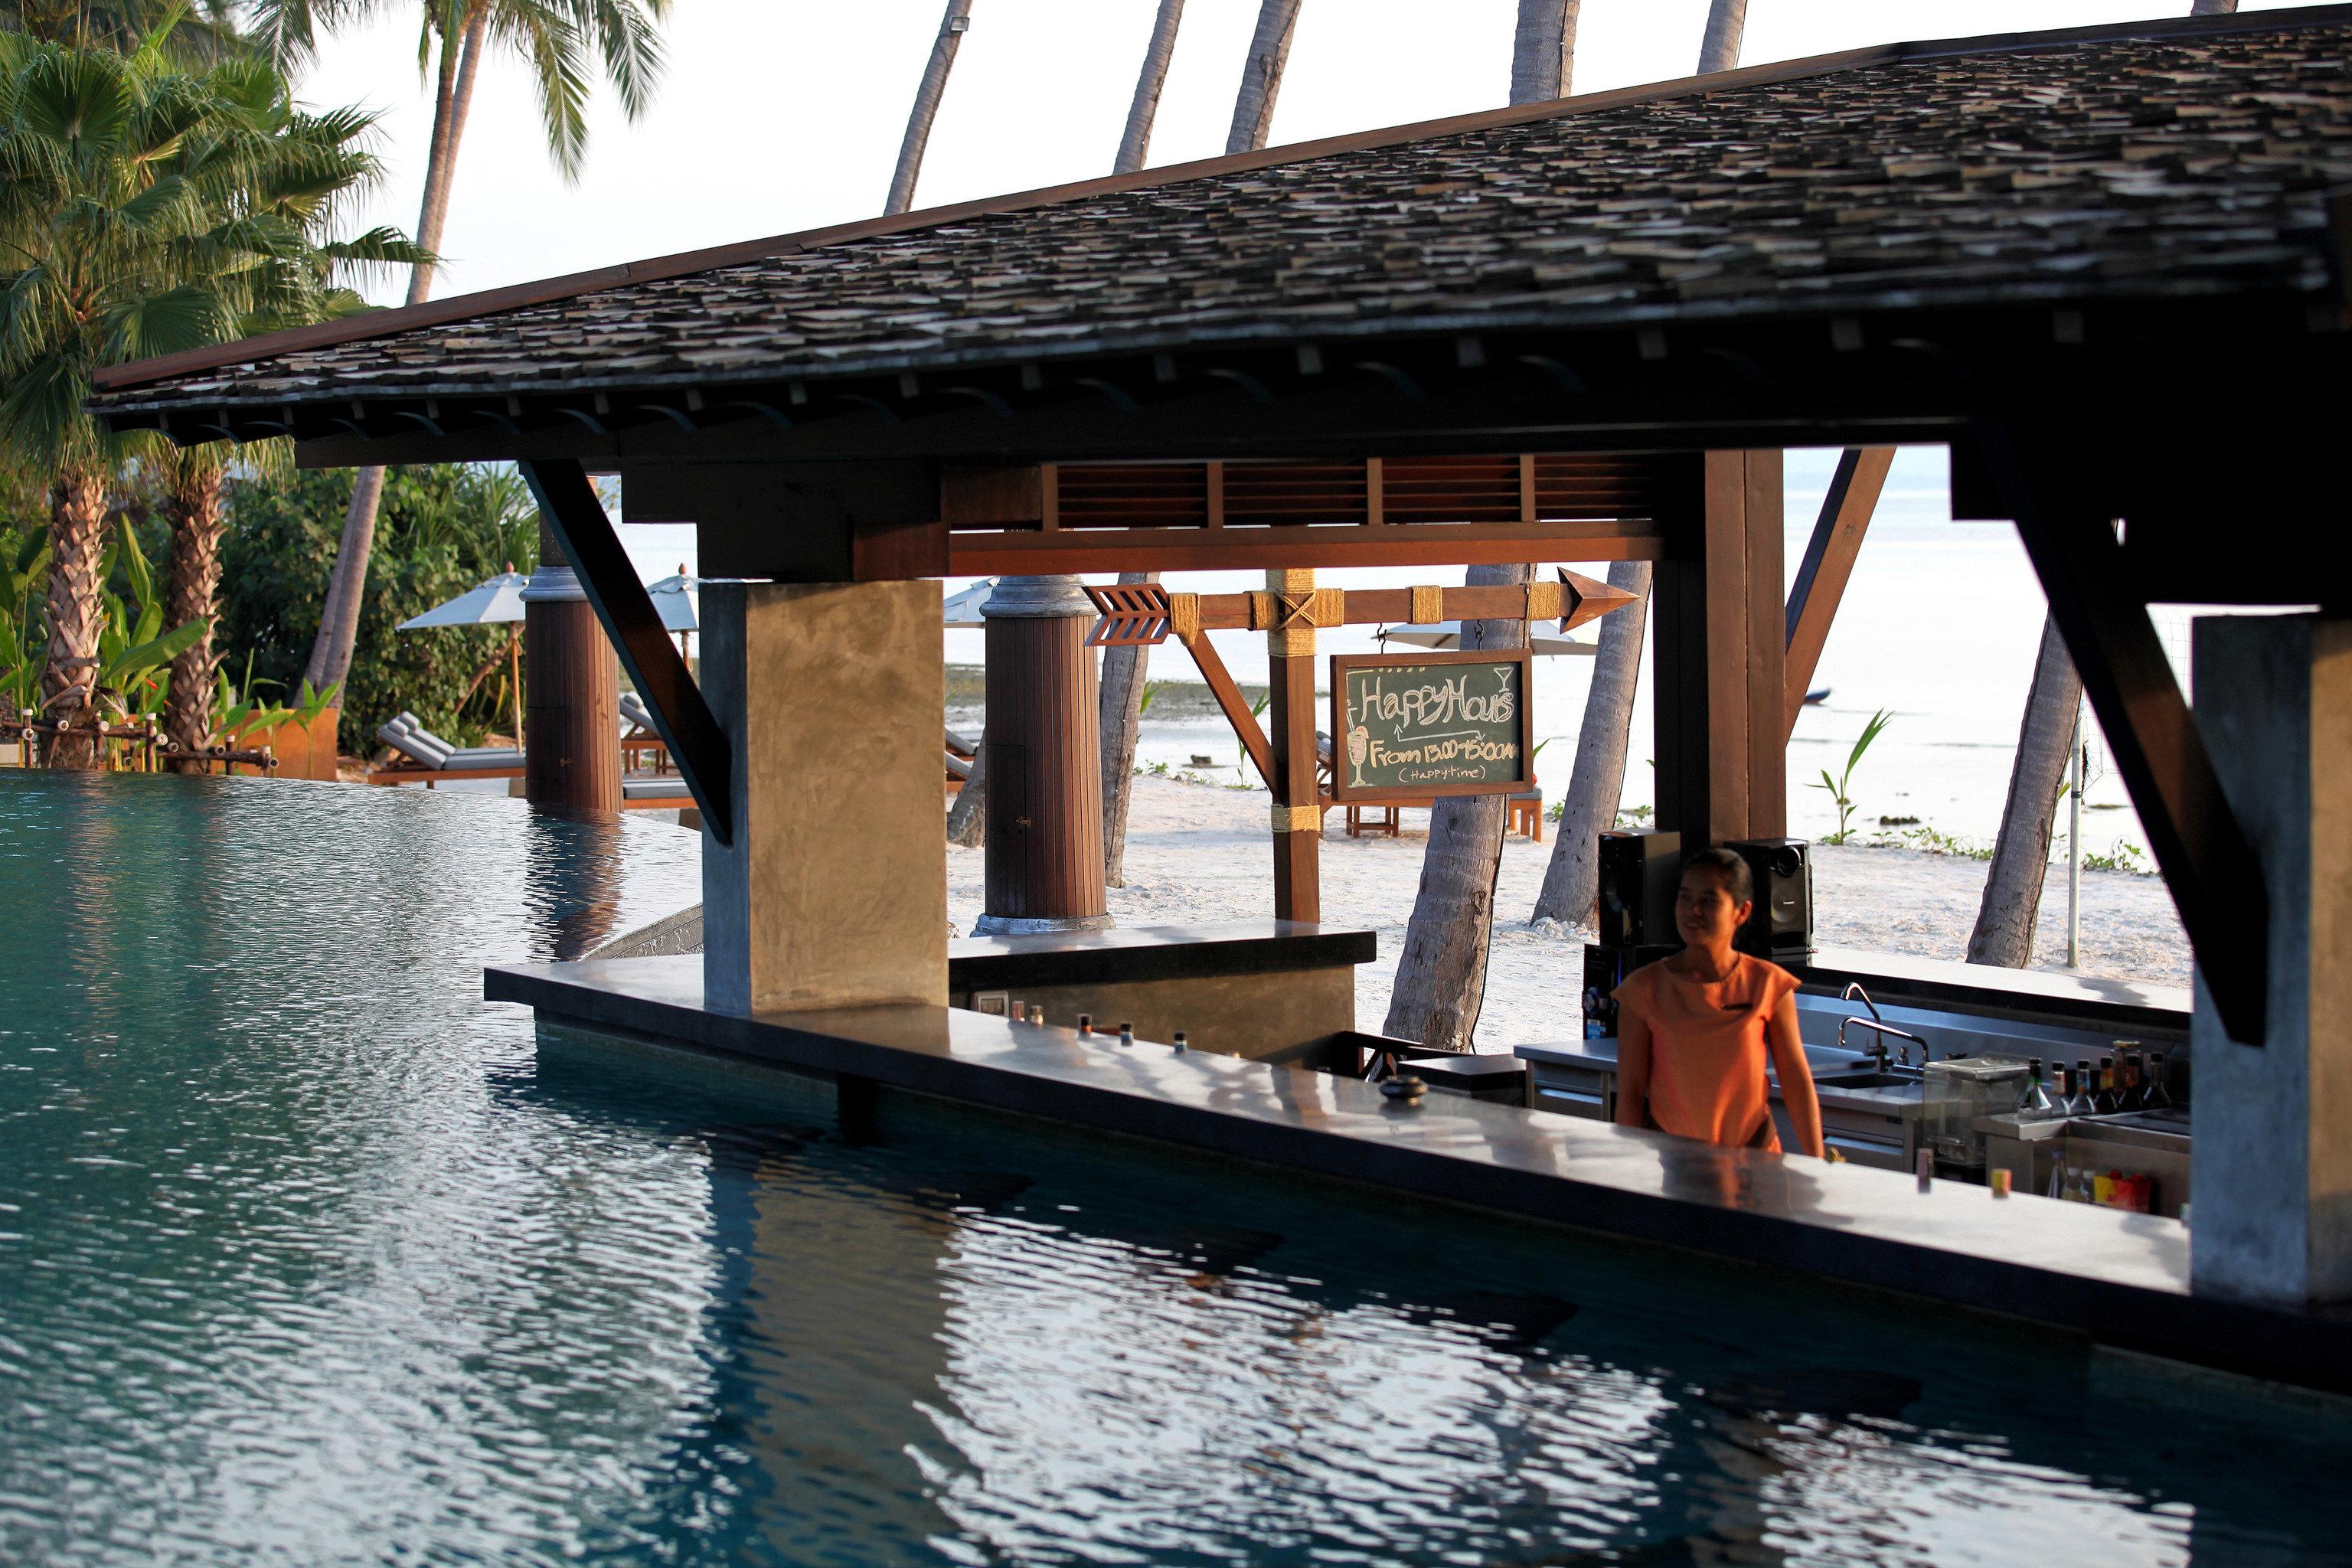 water boathouse vehicle dock Resort waterway Boat